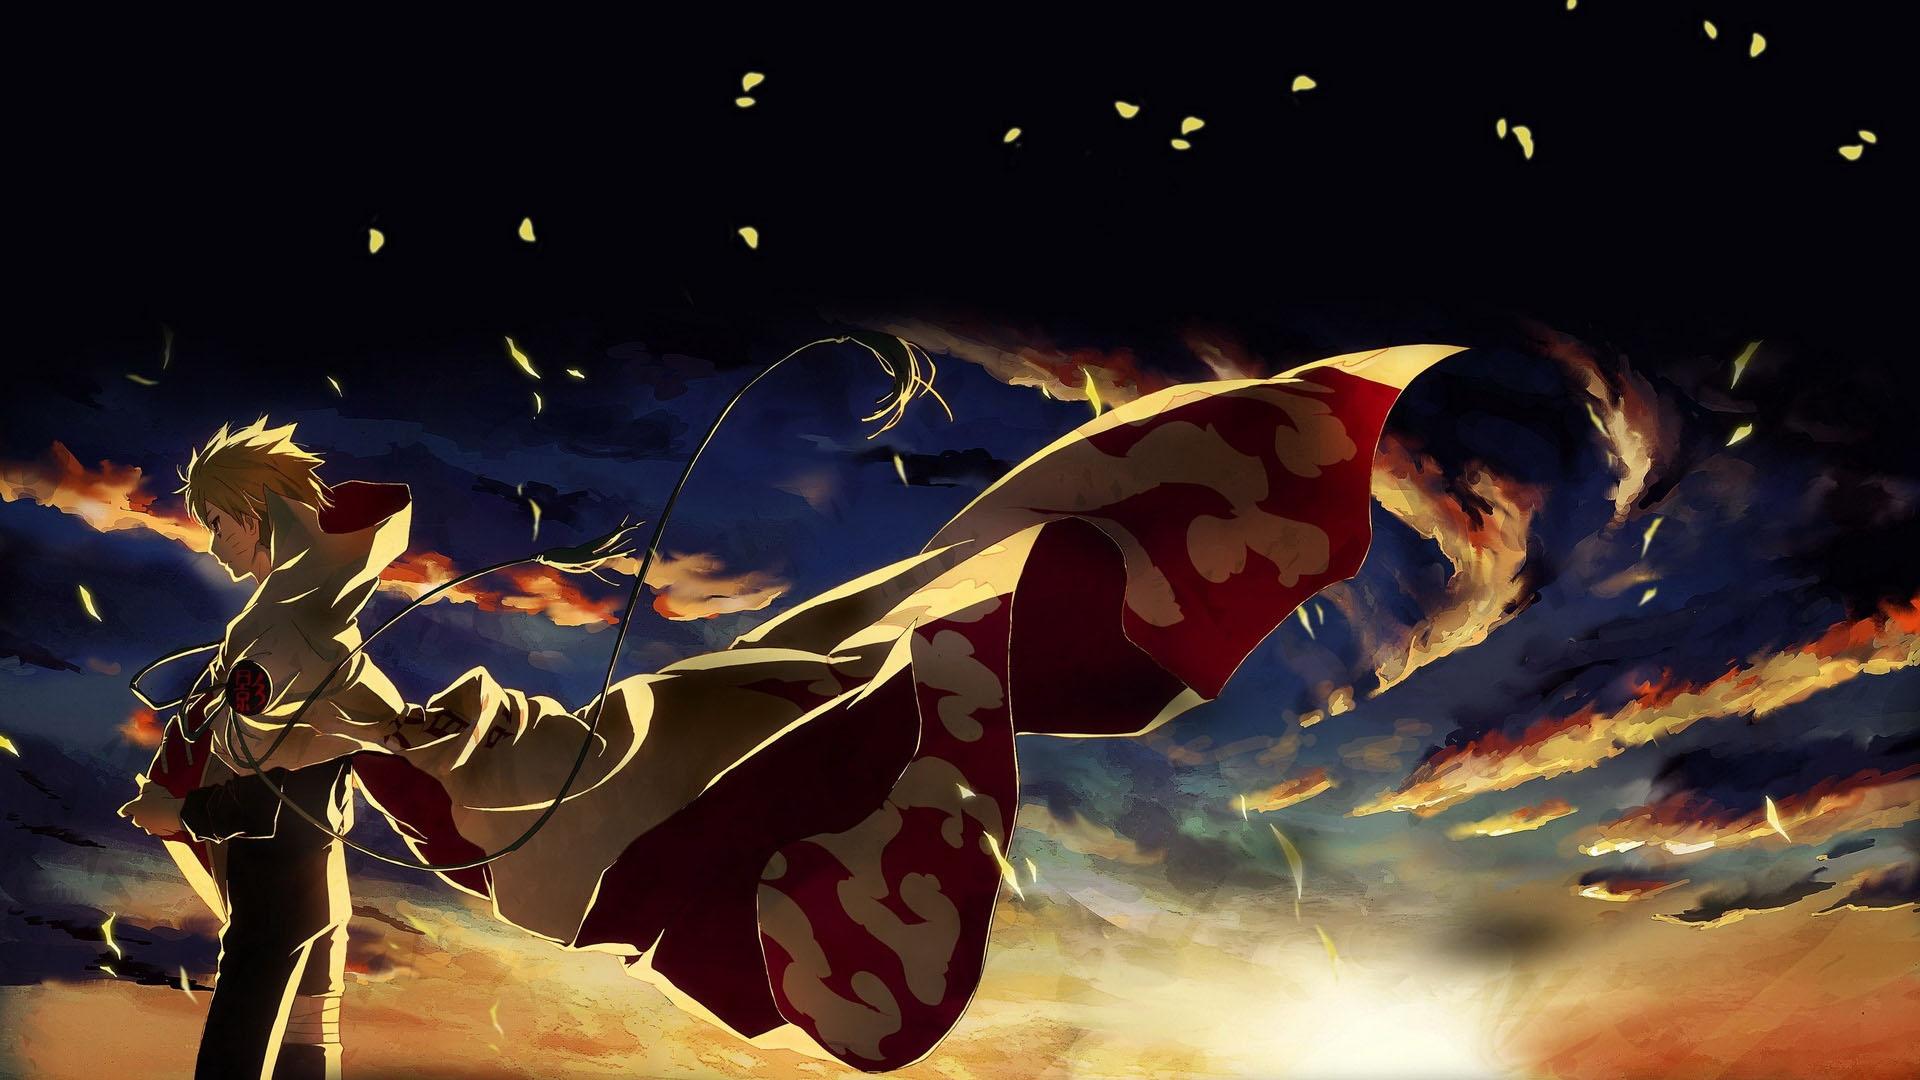 cool boy anime background wallpapers wallpaper aaaaaaaak8k 1920x1080